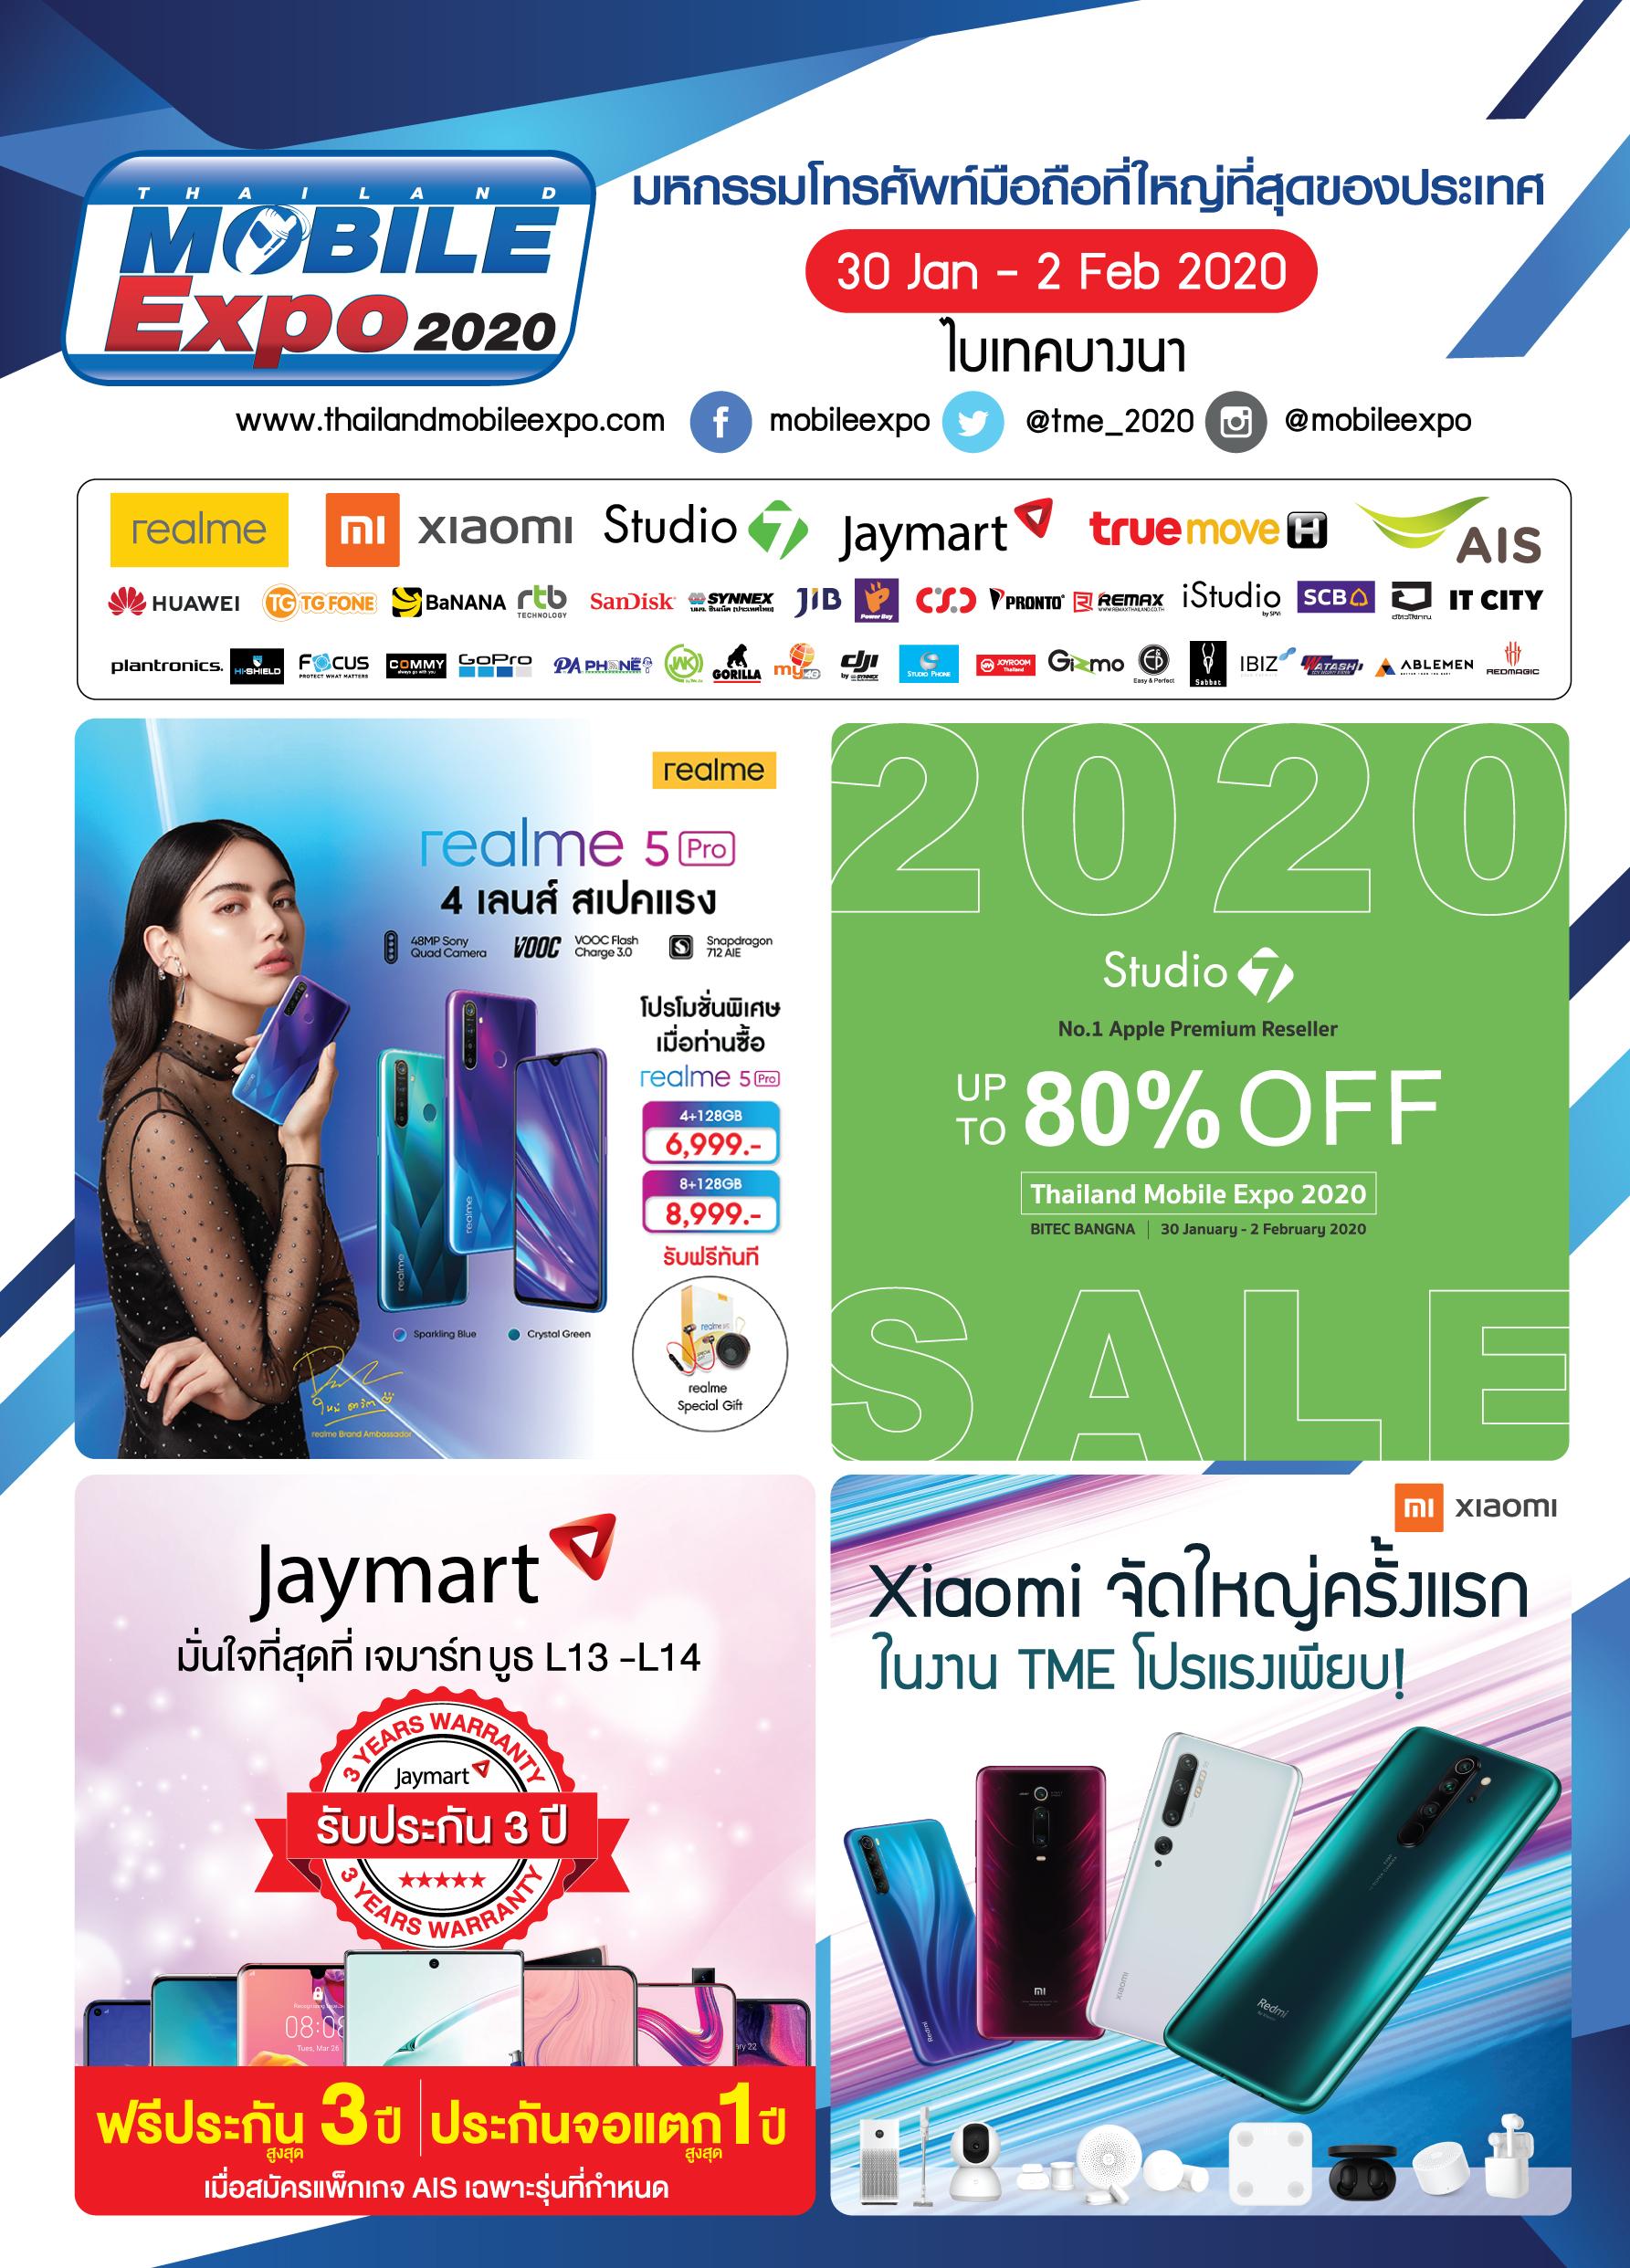 brochure promotion Thailand Mobile Expo 2020 jan 30 - feb 2